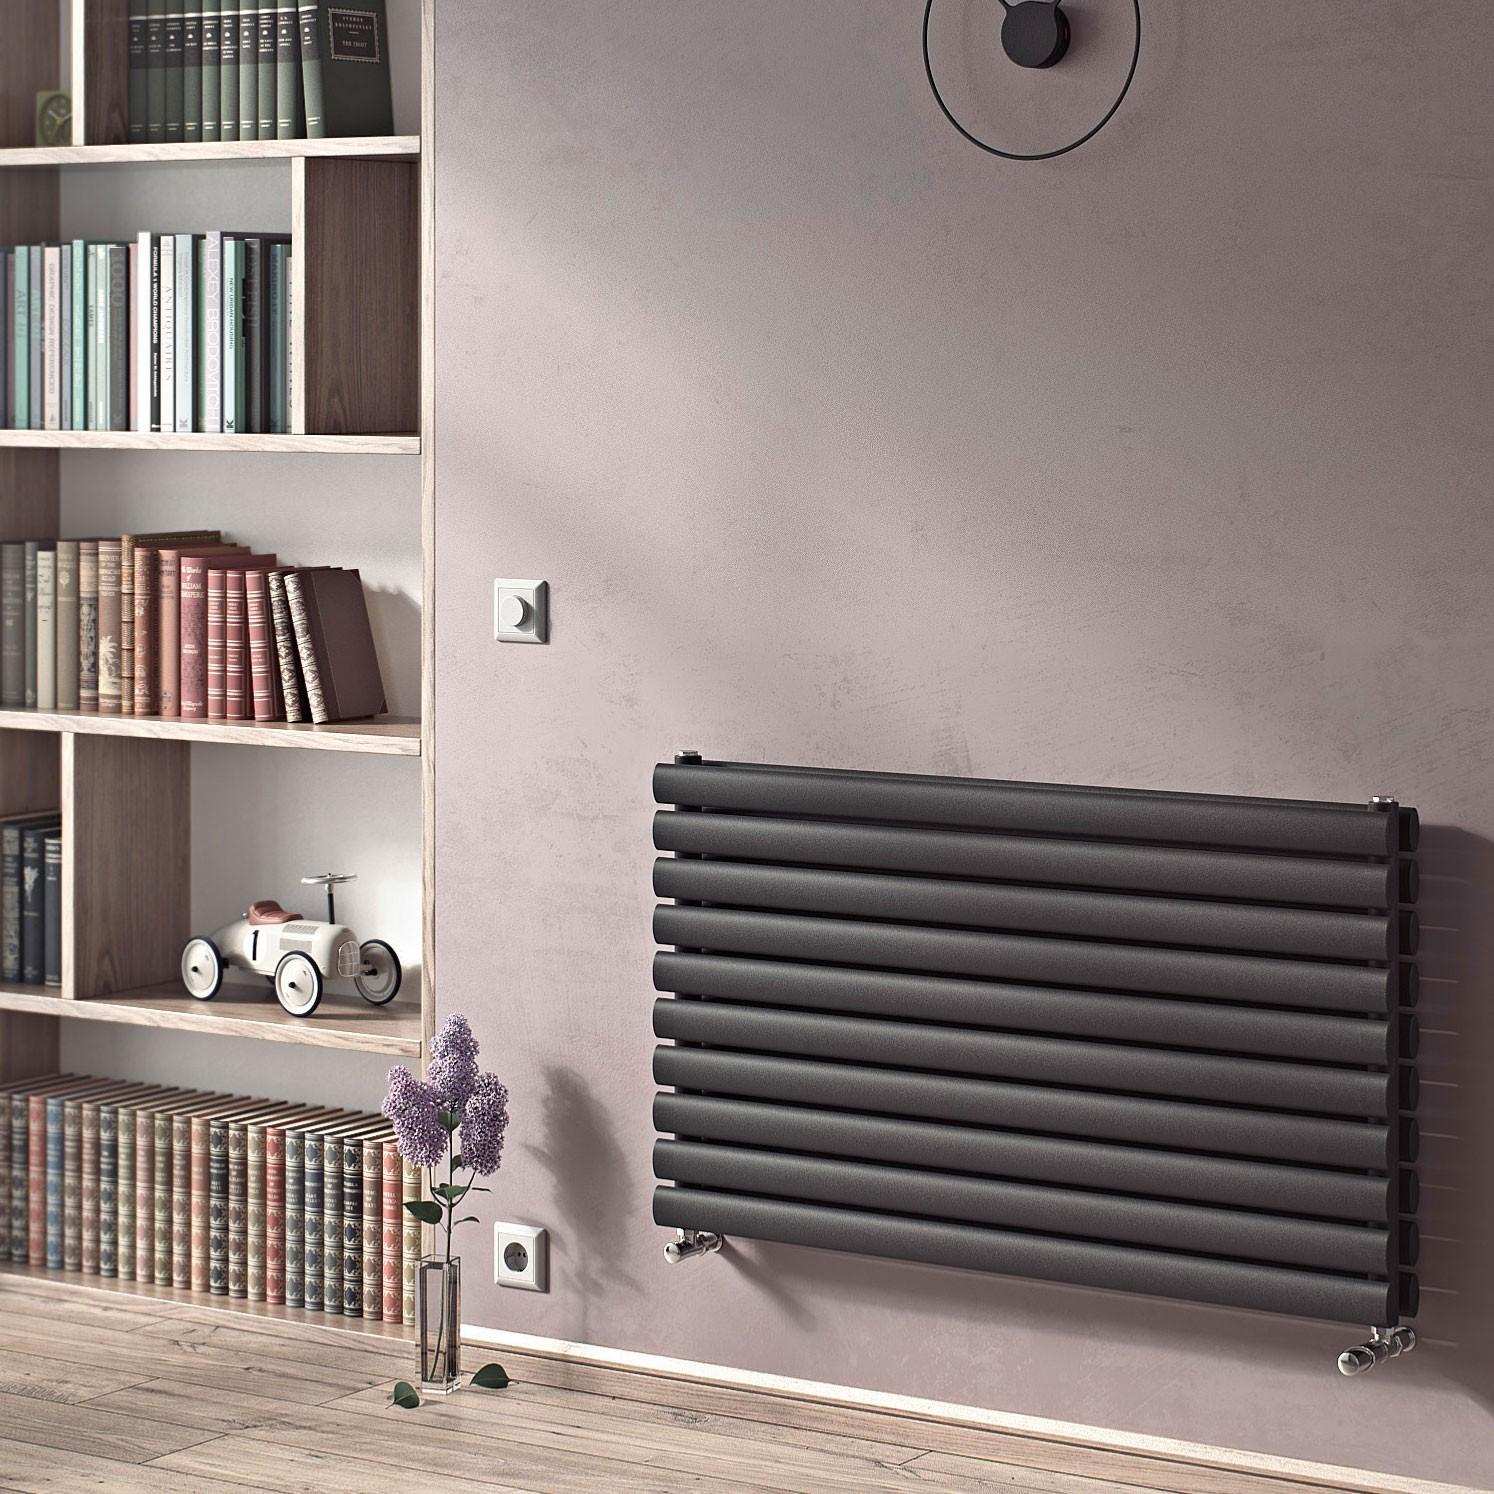 Anthracite radiator